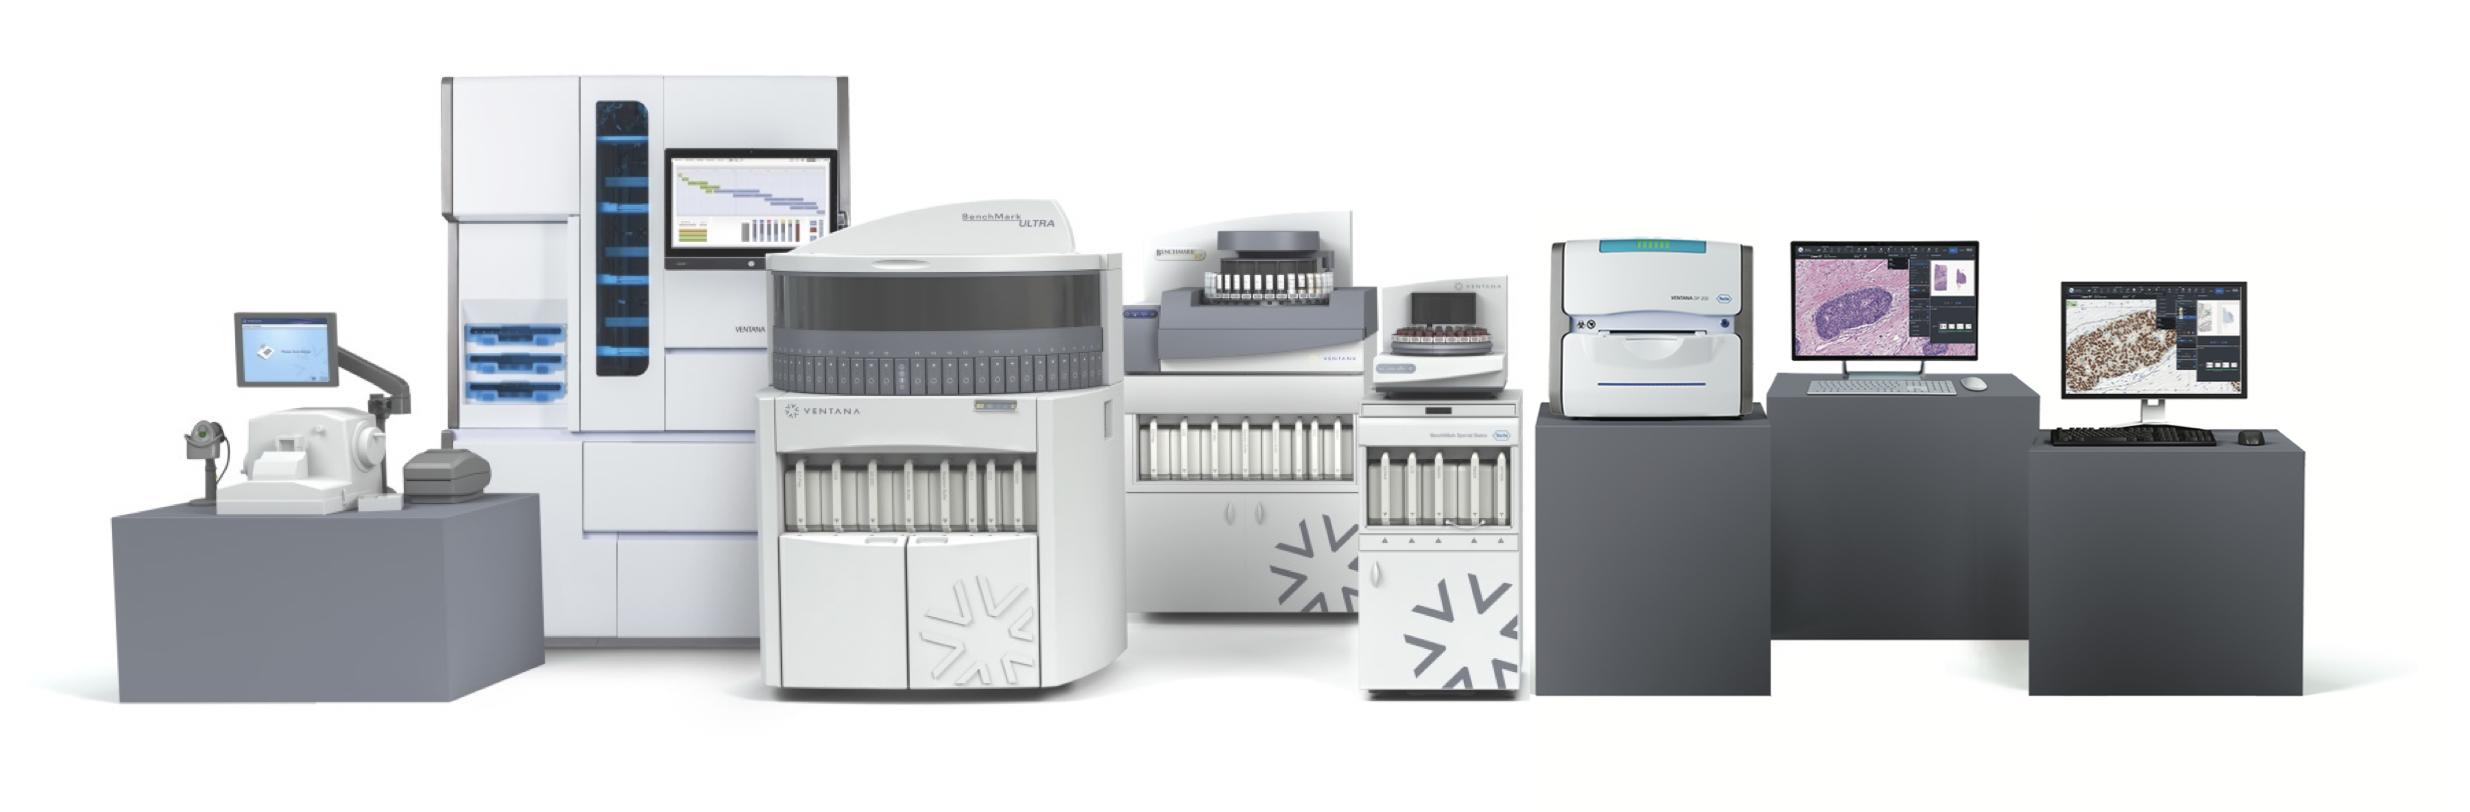 Roche Digital Pathology Solution